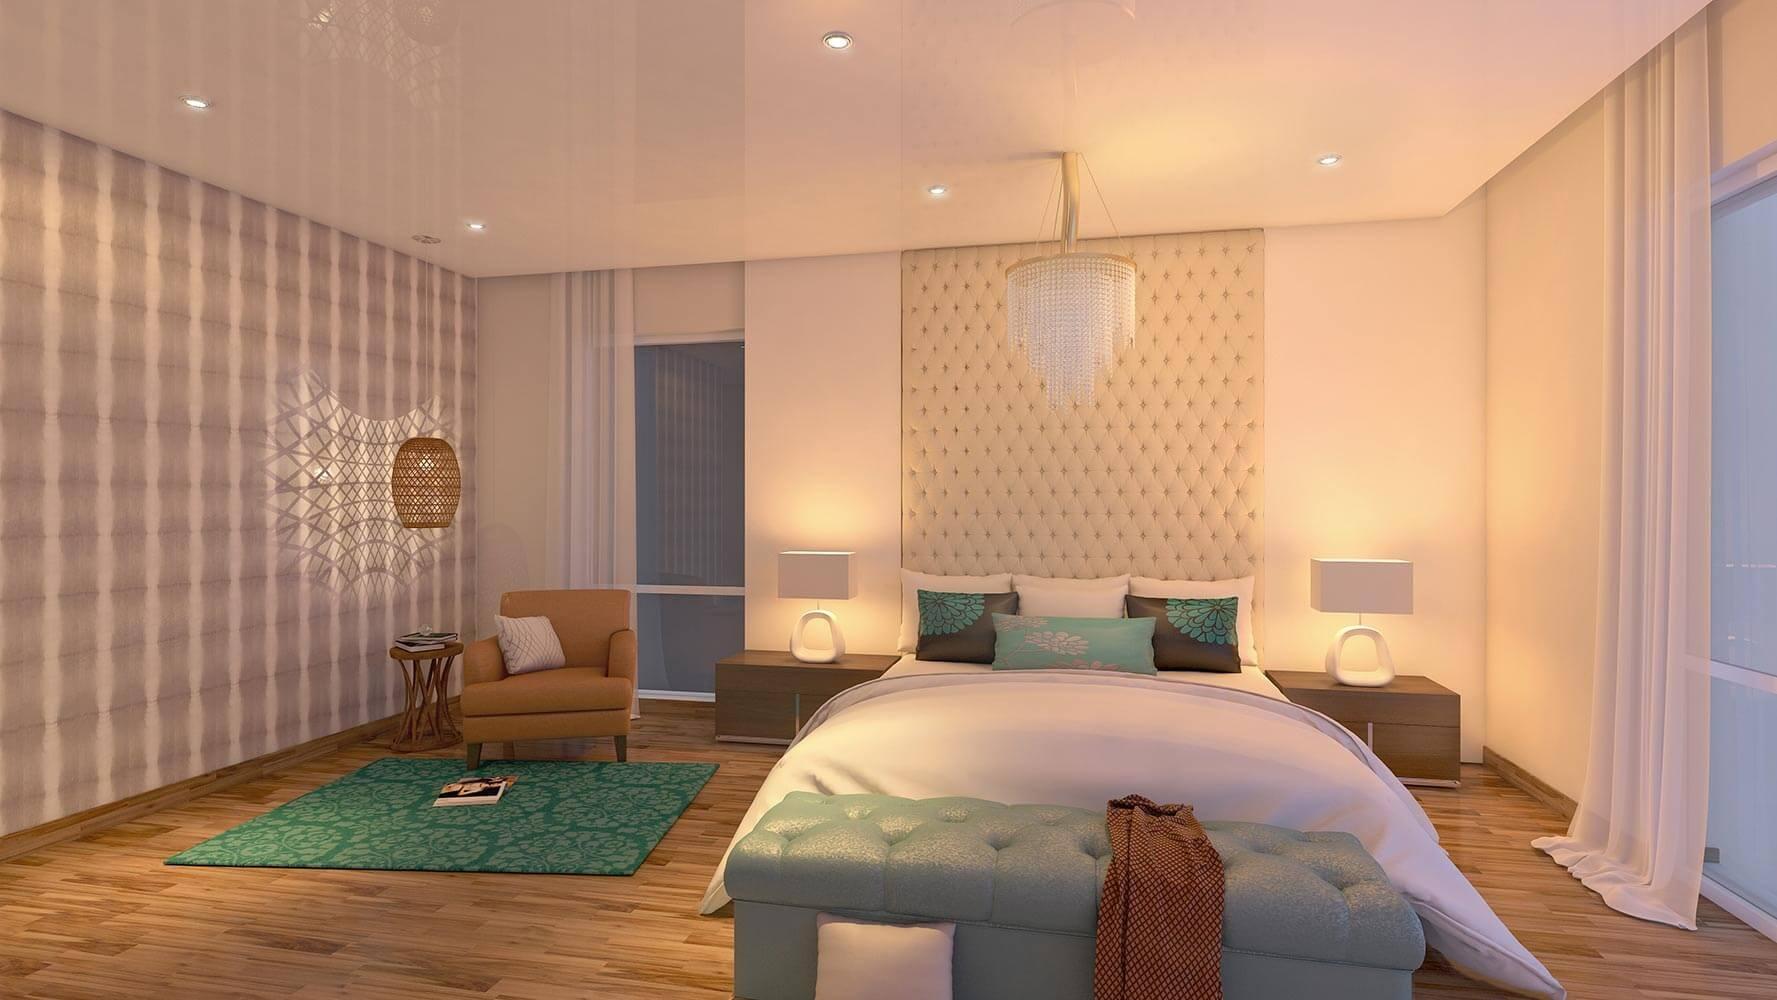 amar westview project apartment interiors2